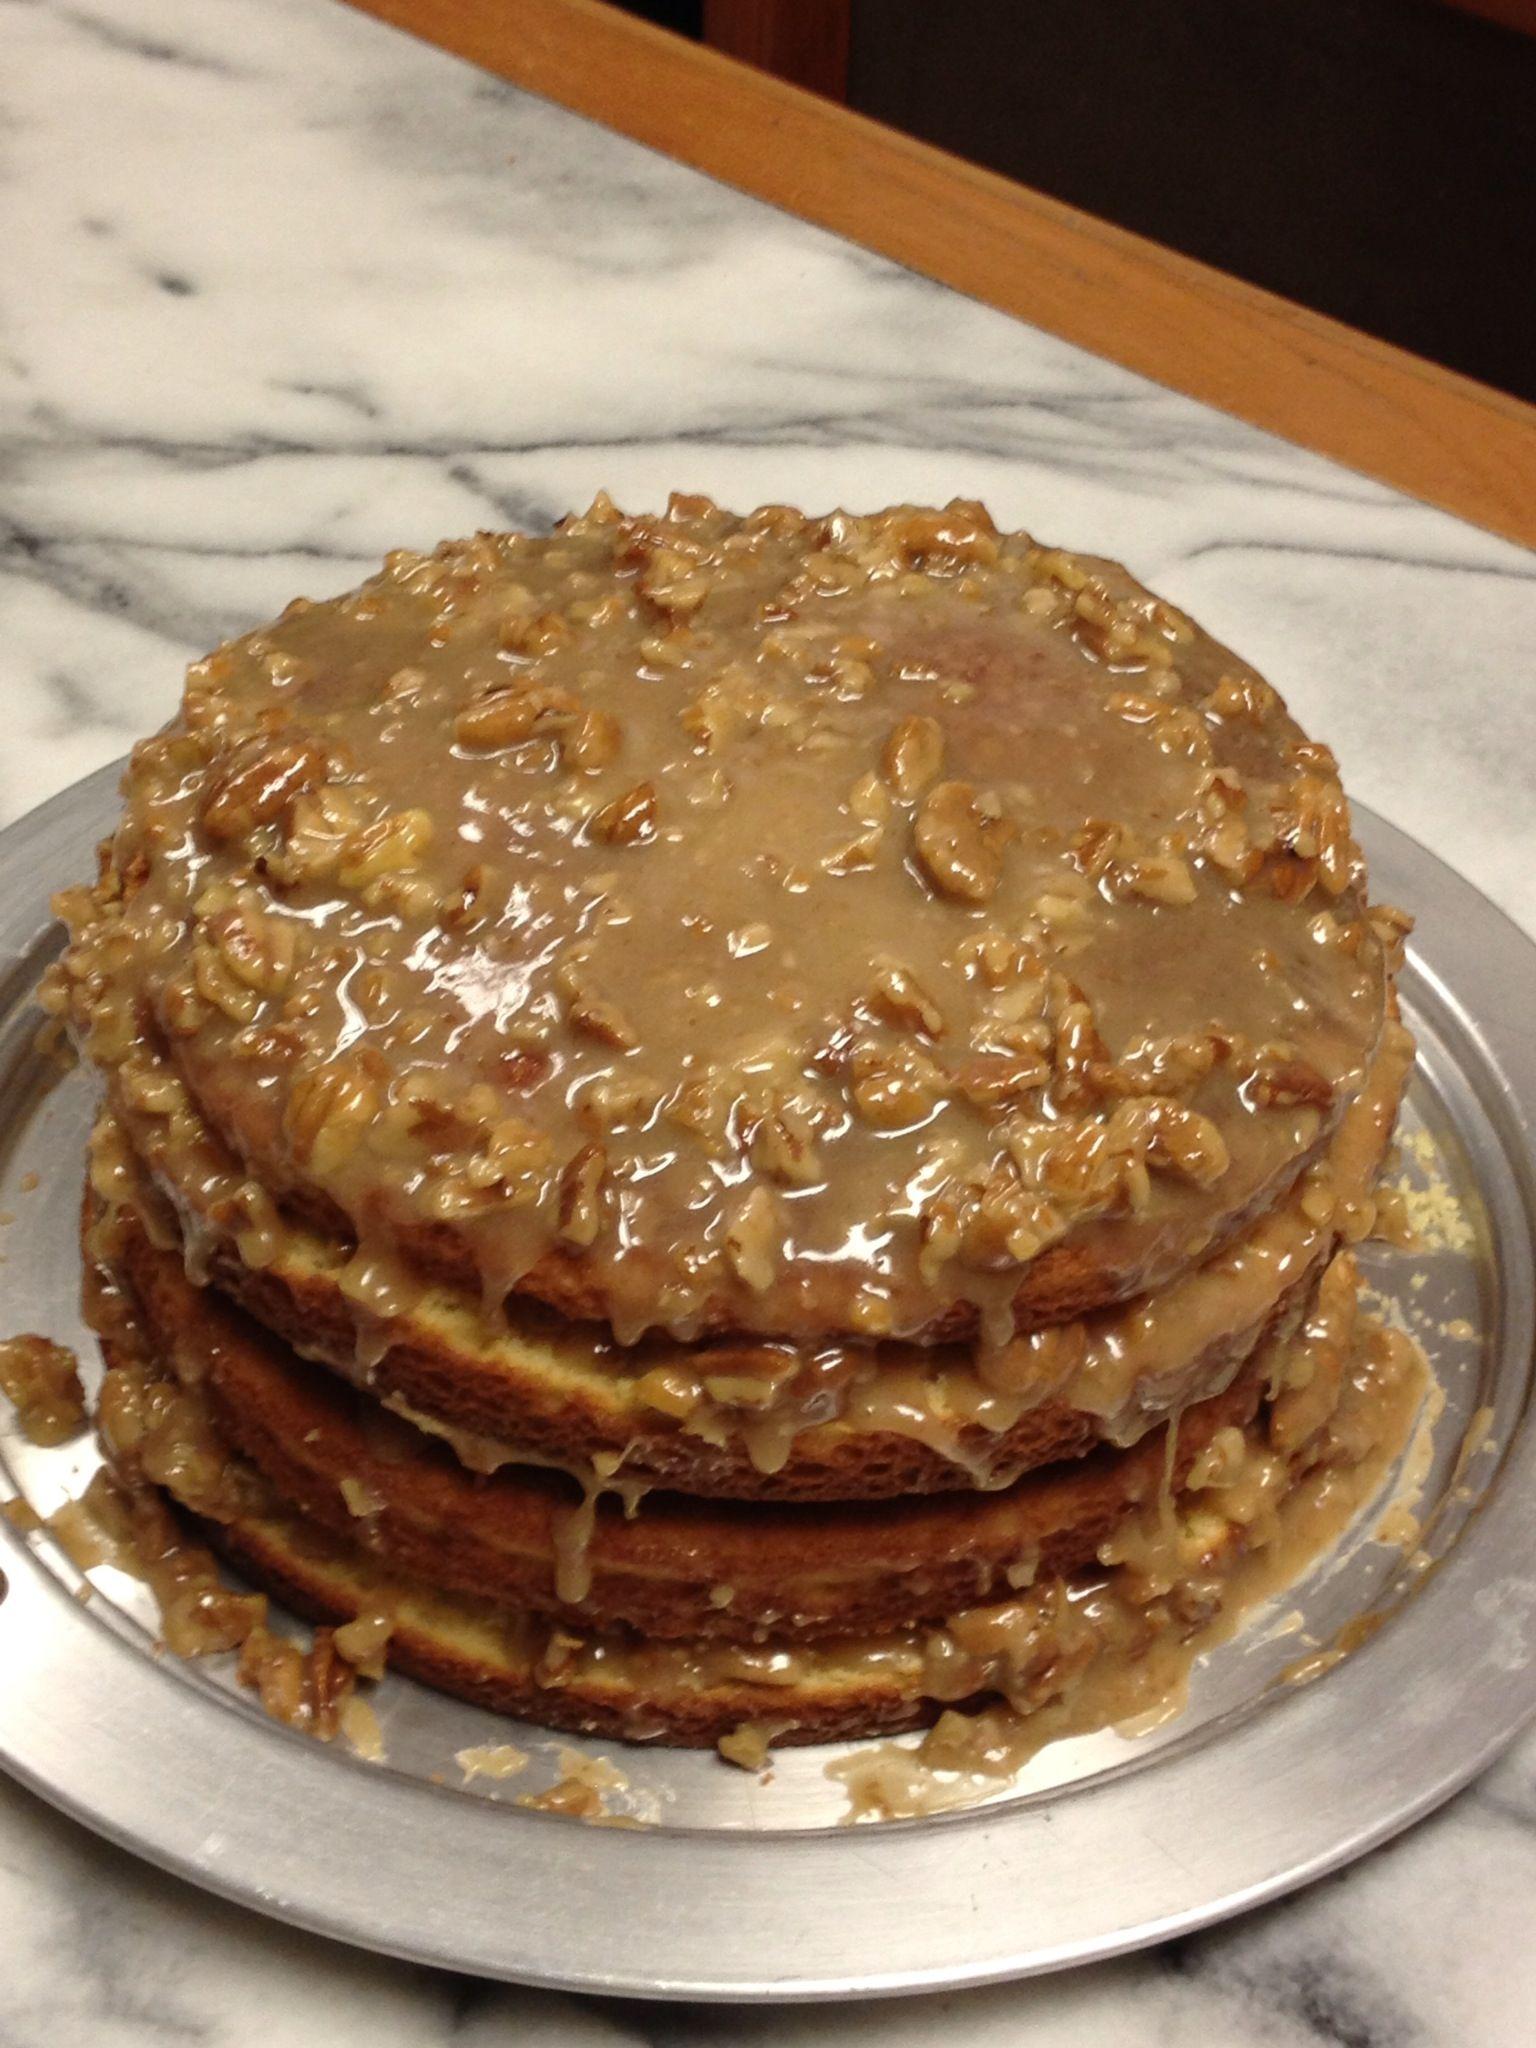 Pecan Praline Cake Recipe